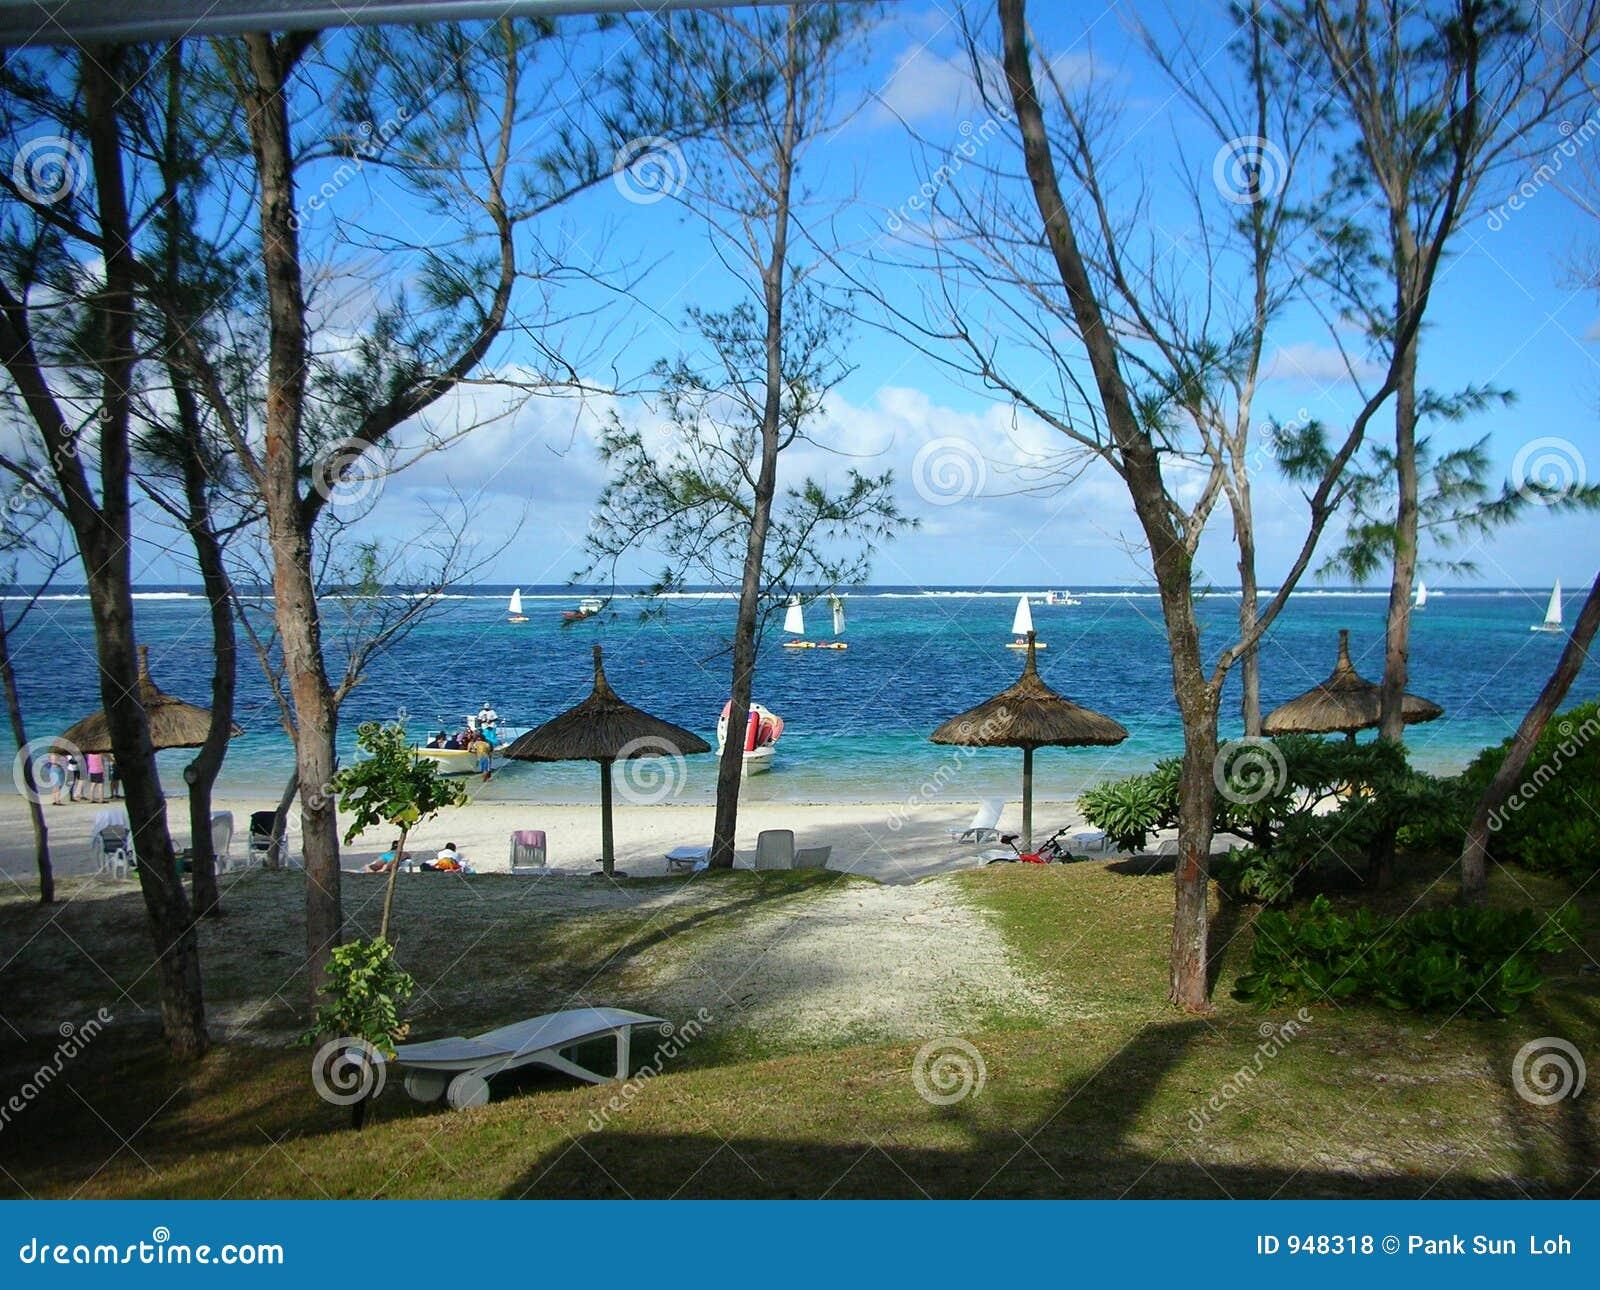 mauritius nude beach vid free